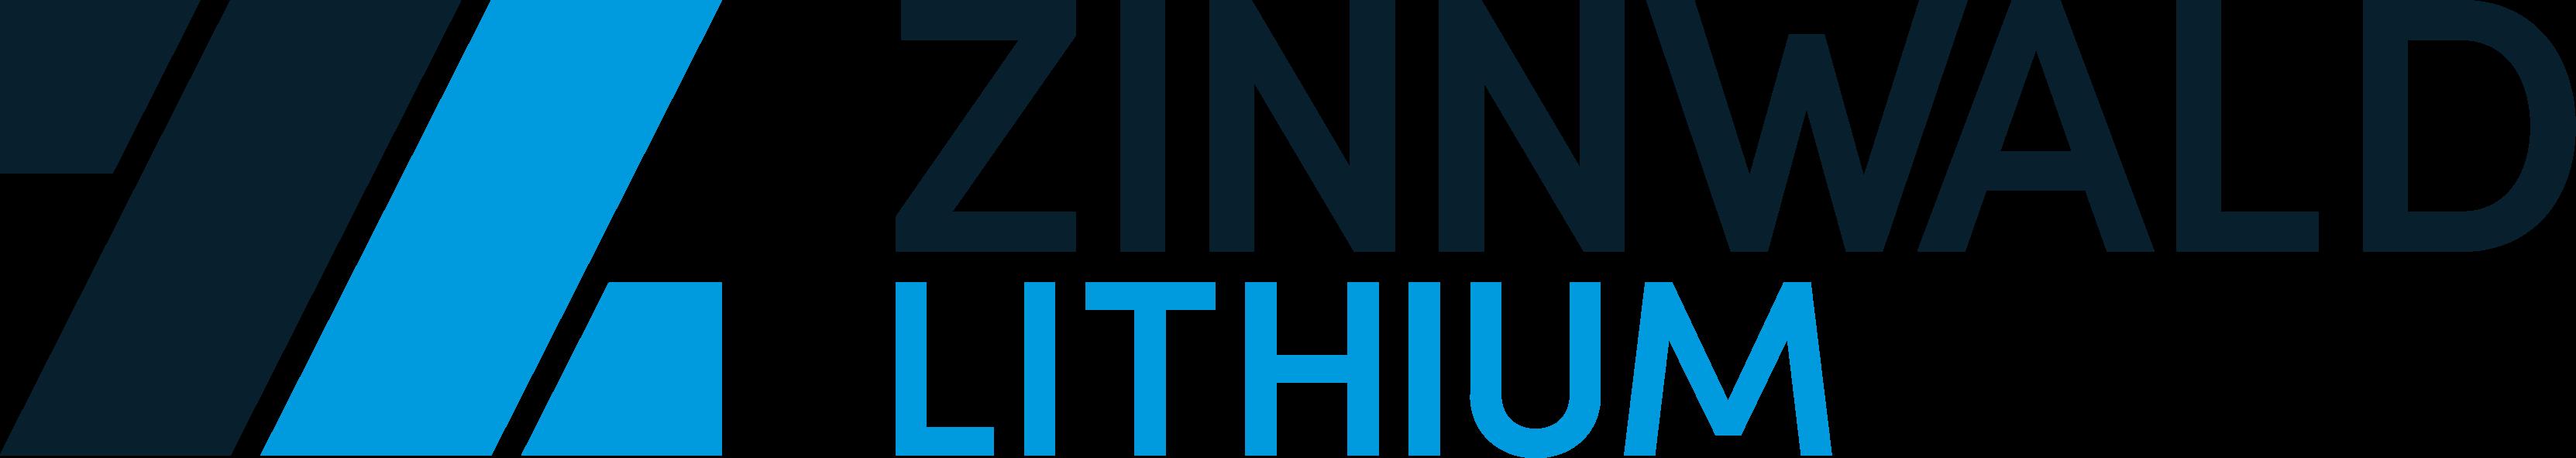 Zinnwald Lithium PLC Logo